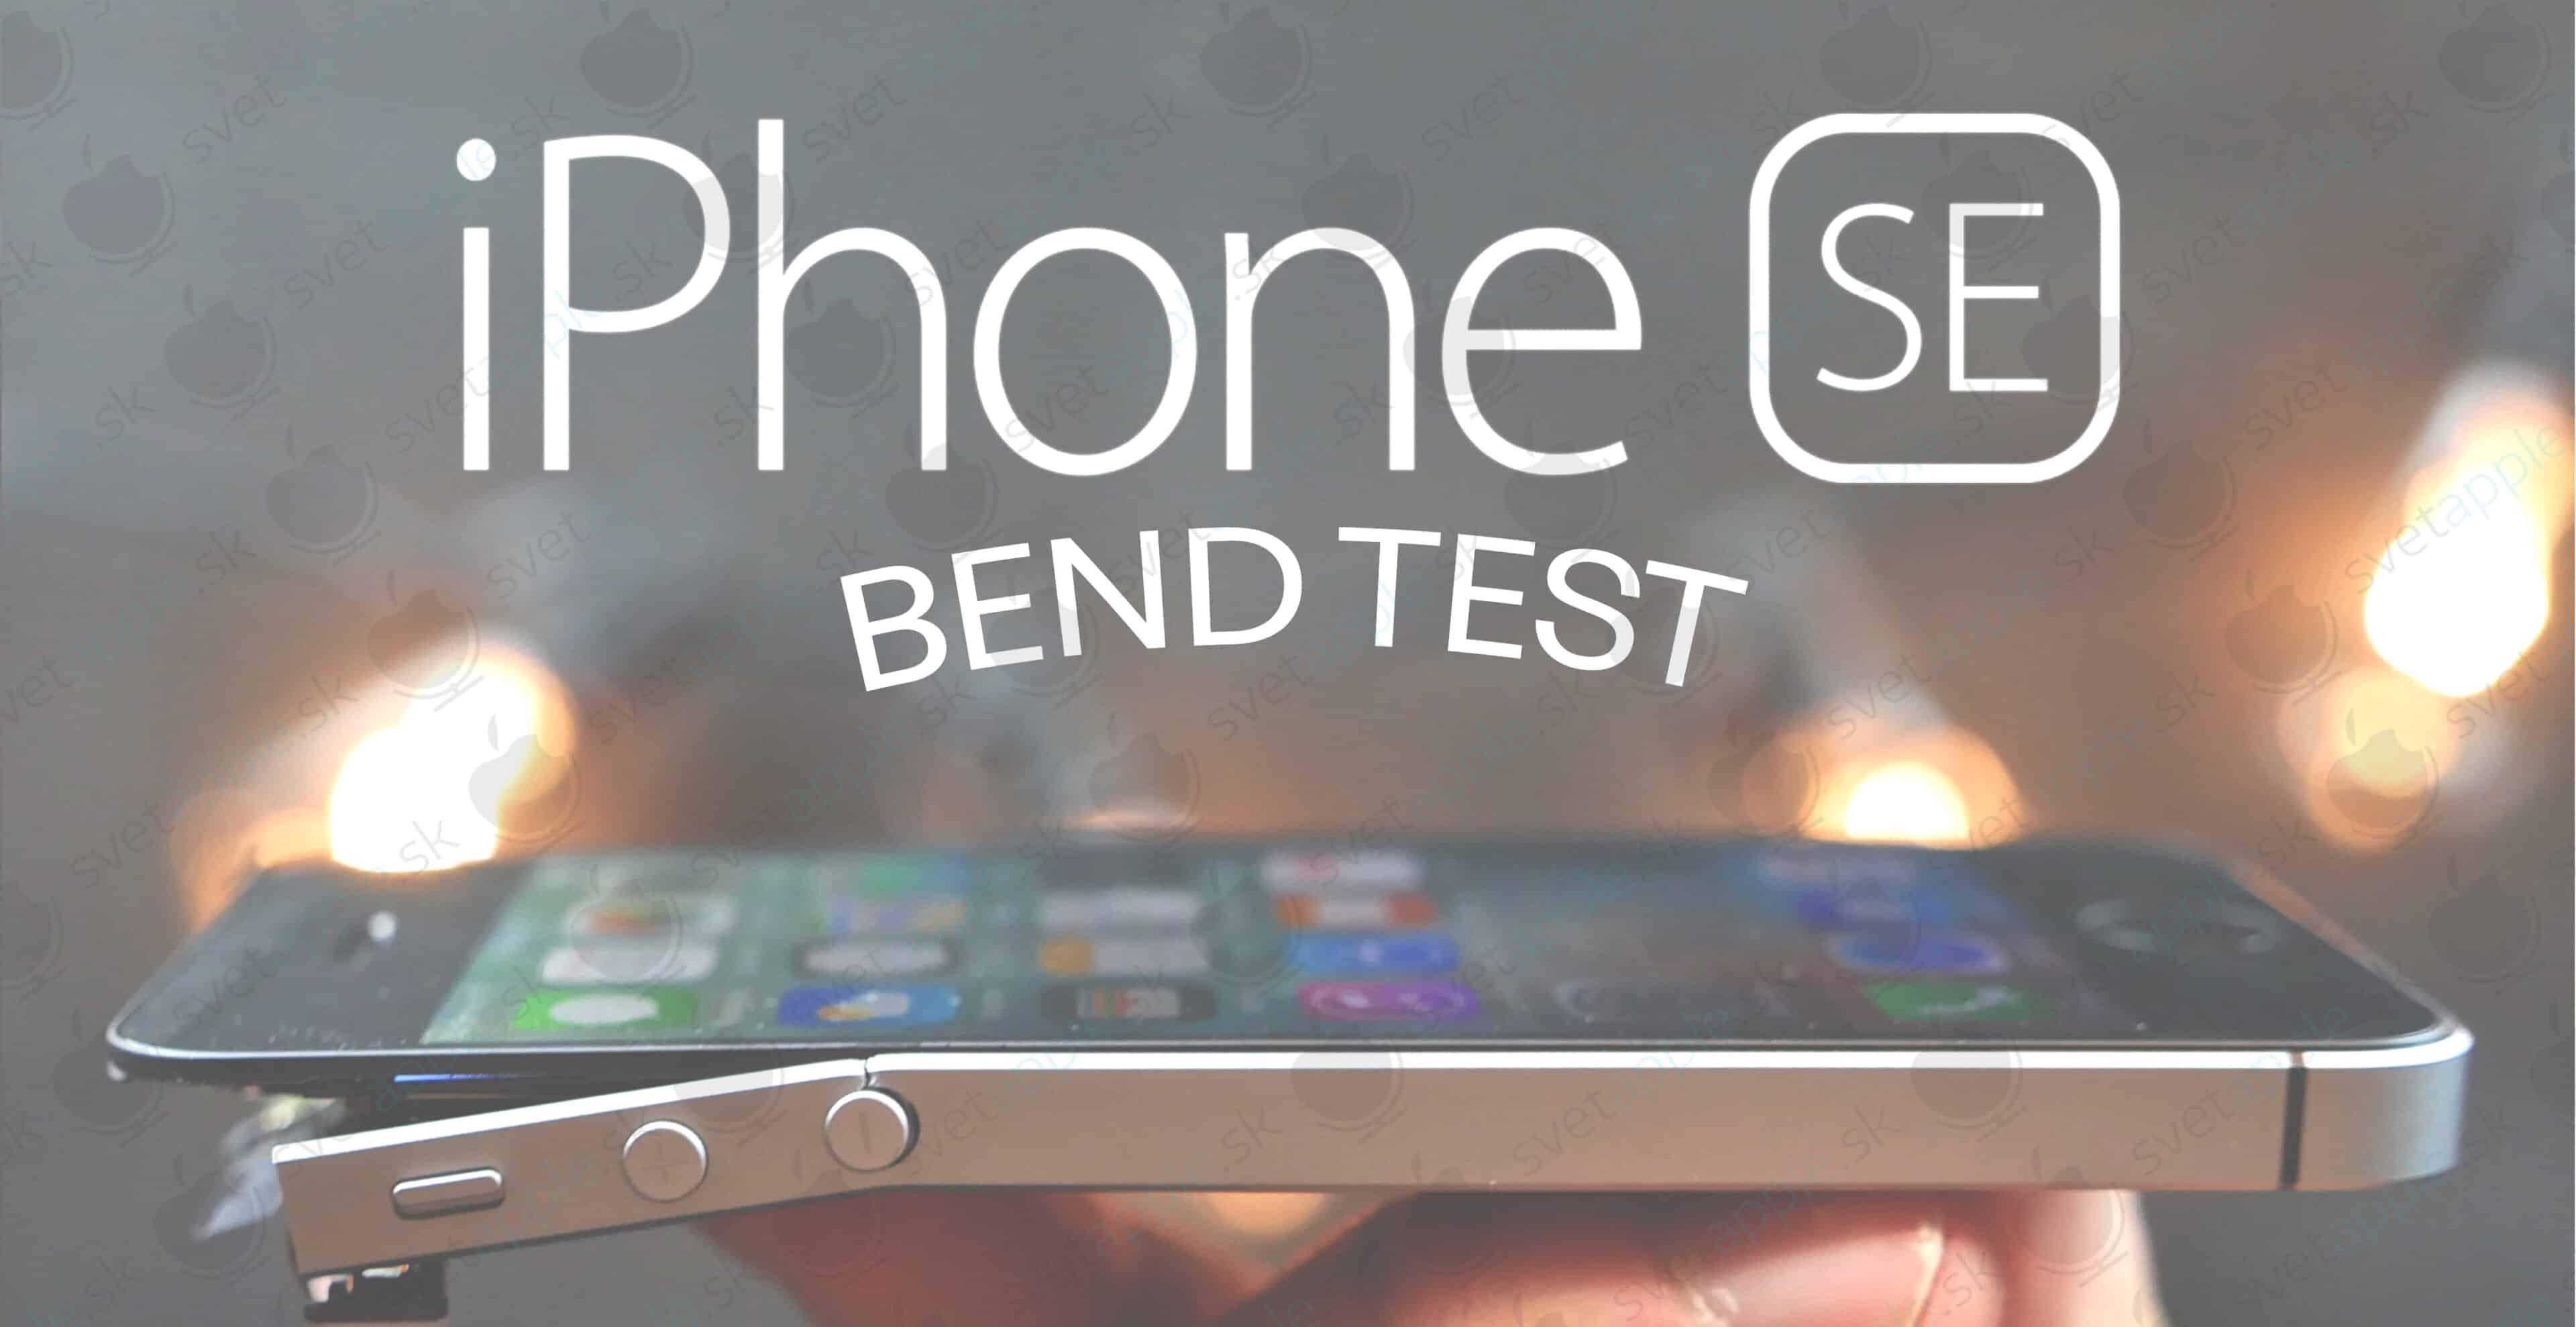 iPhoneSE-bend-test----titulná-fotografia---SvetApple